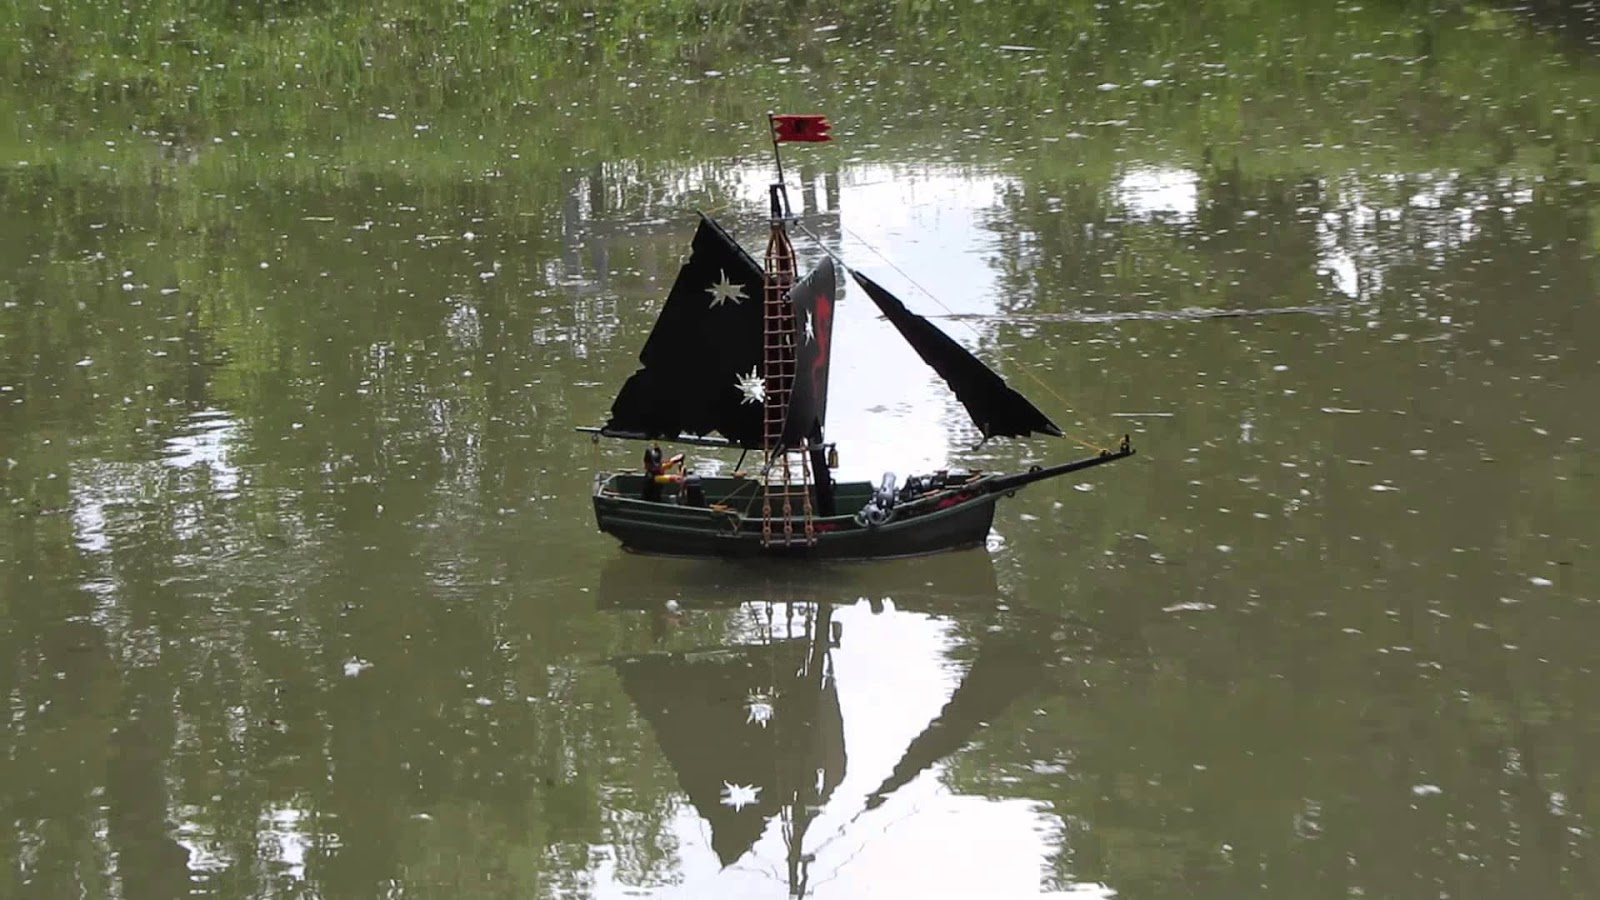 mast prop and test prop